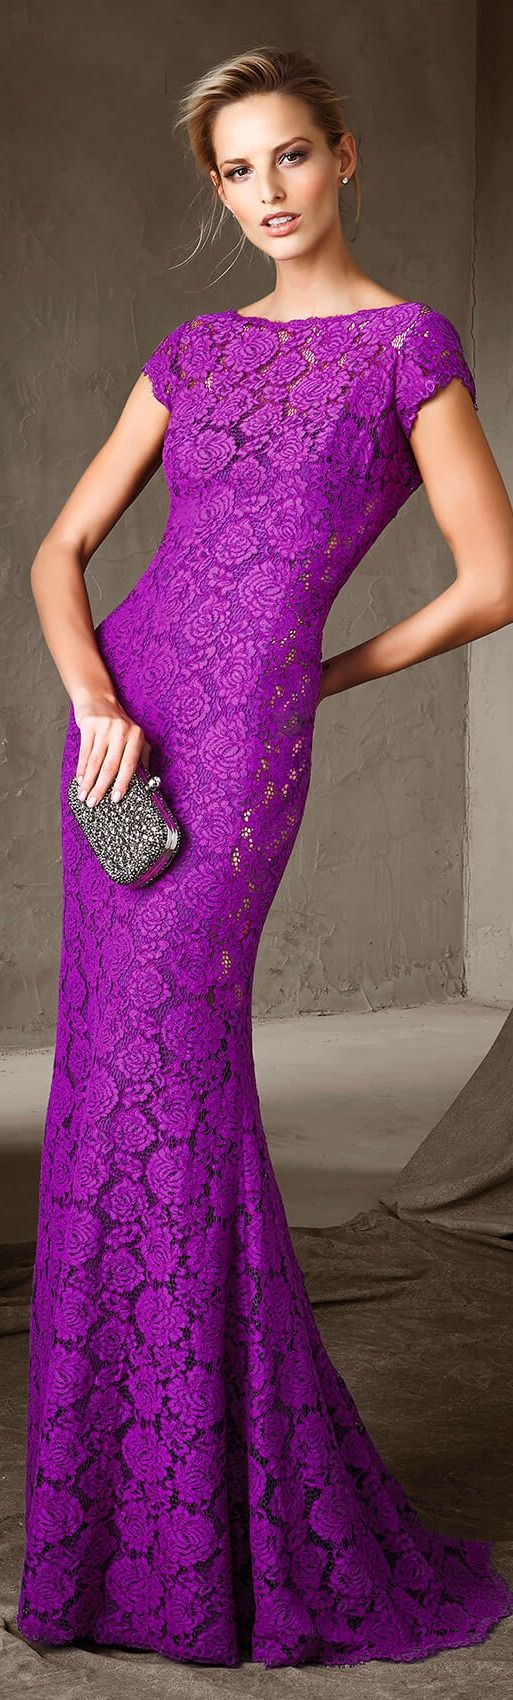 best prom dresses images on pinterest clothes sherri hill